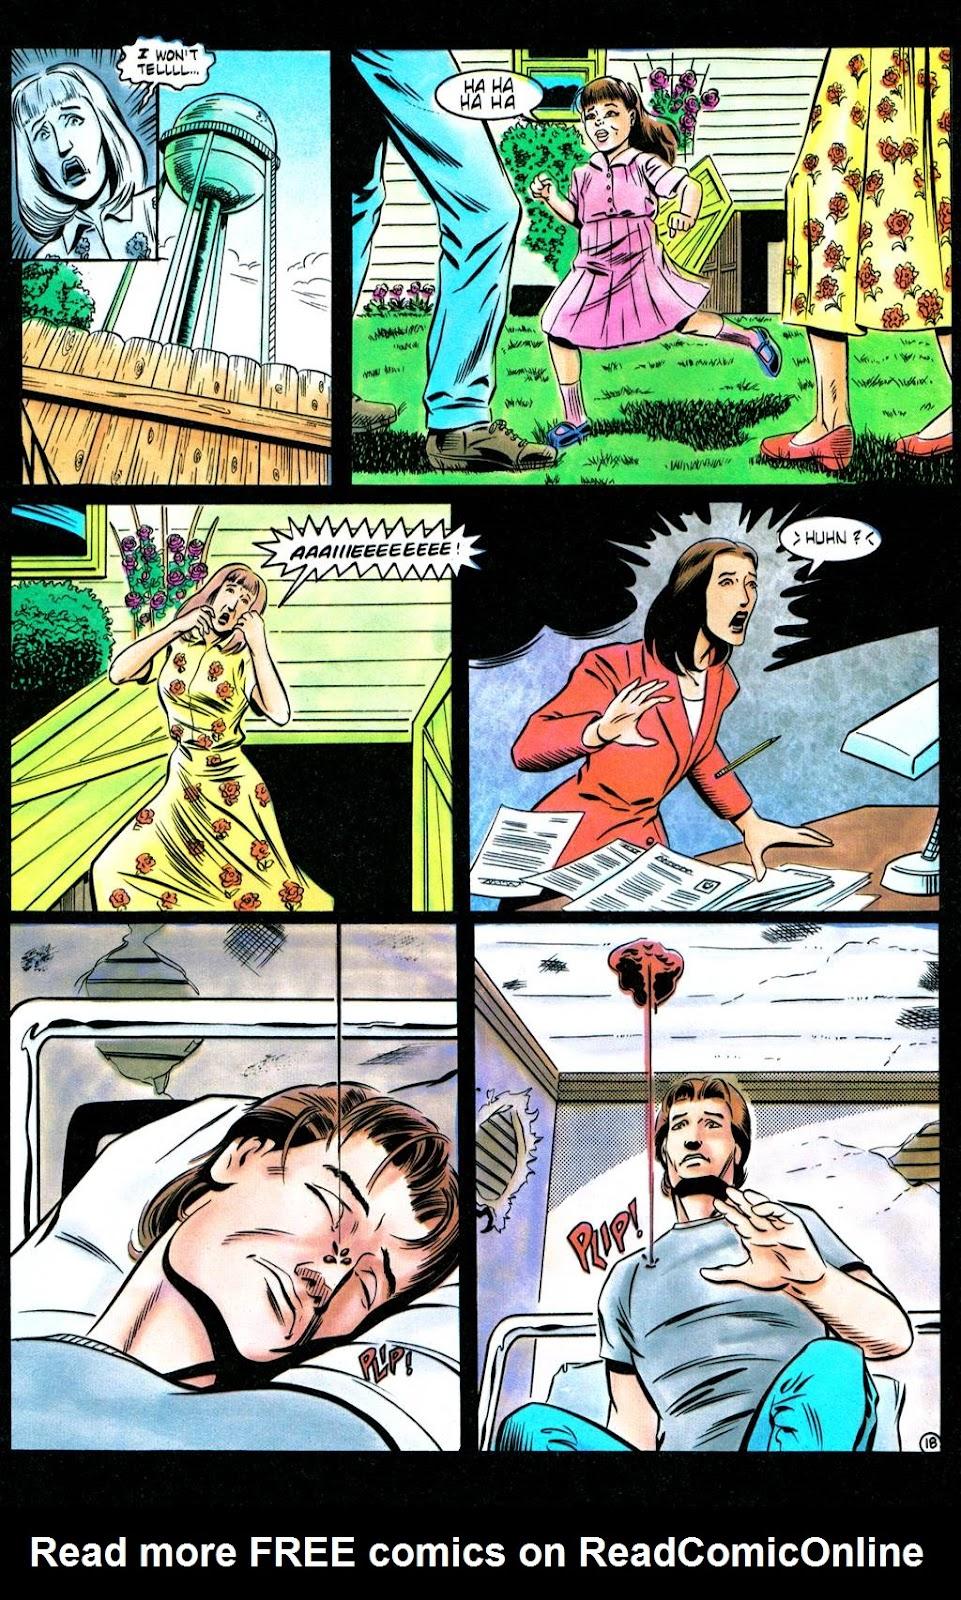 Read online Freddy's Dead: The Final Nightmare comic -  Issue #1 - 22